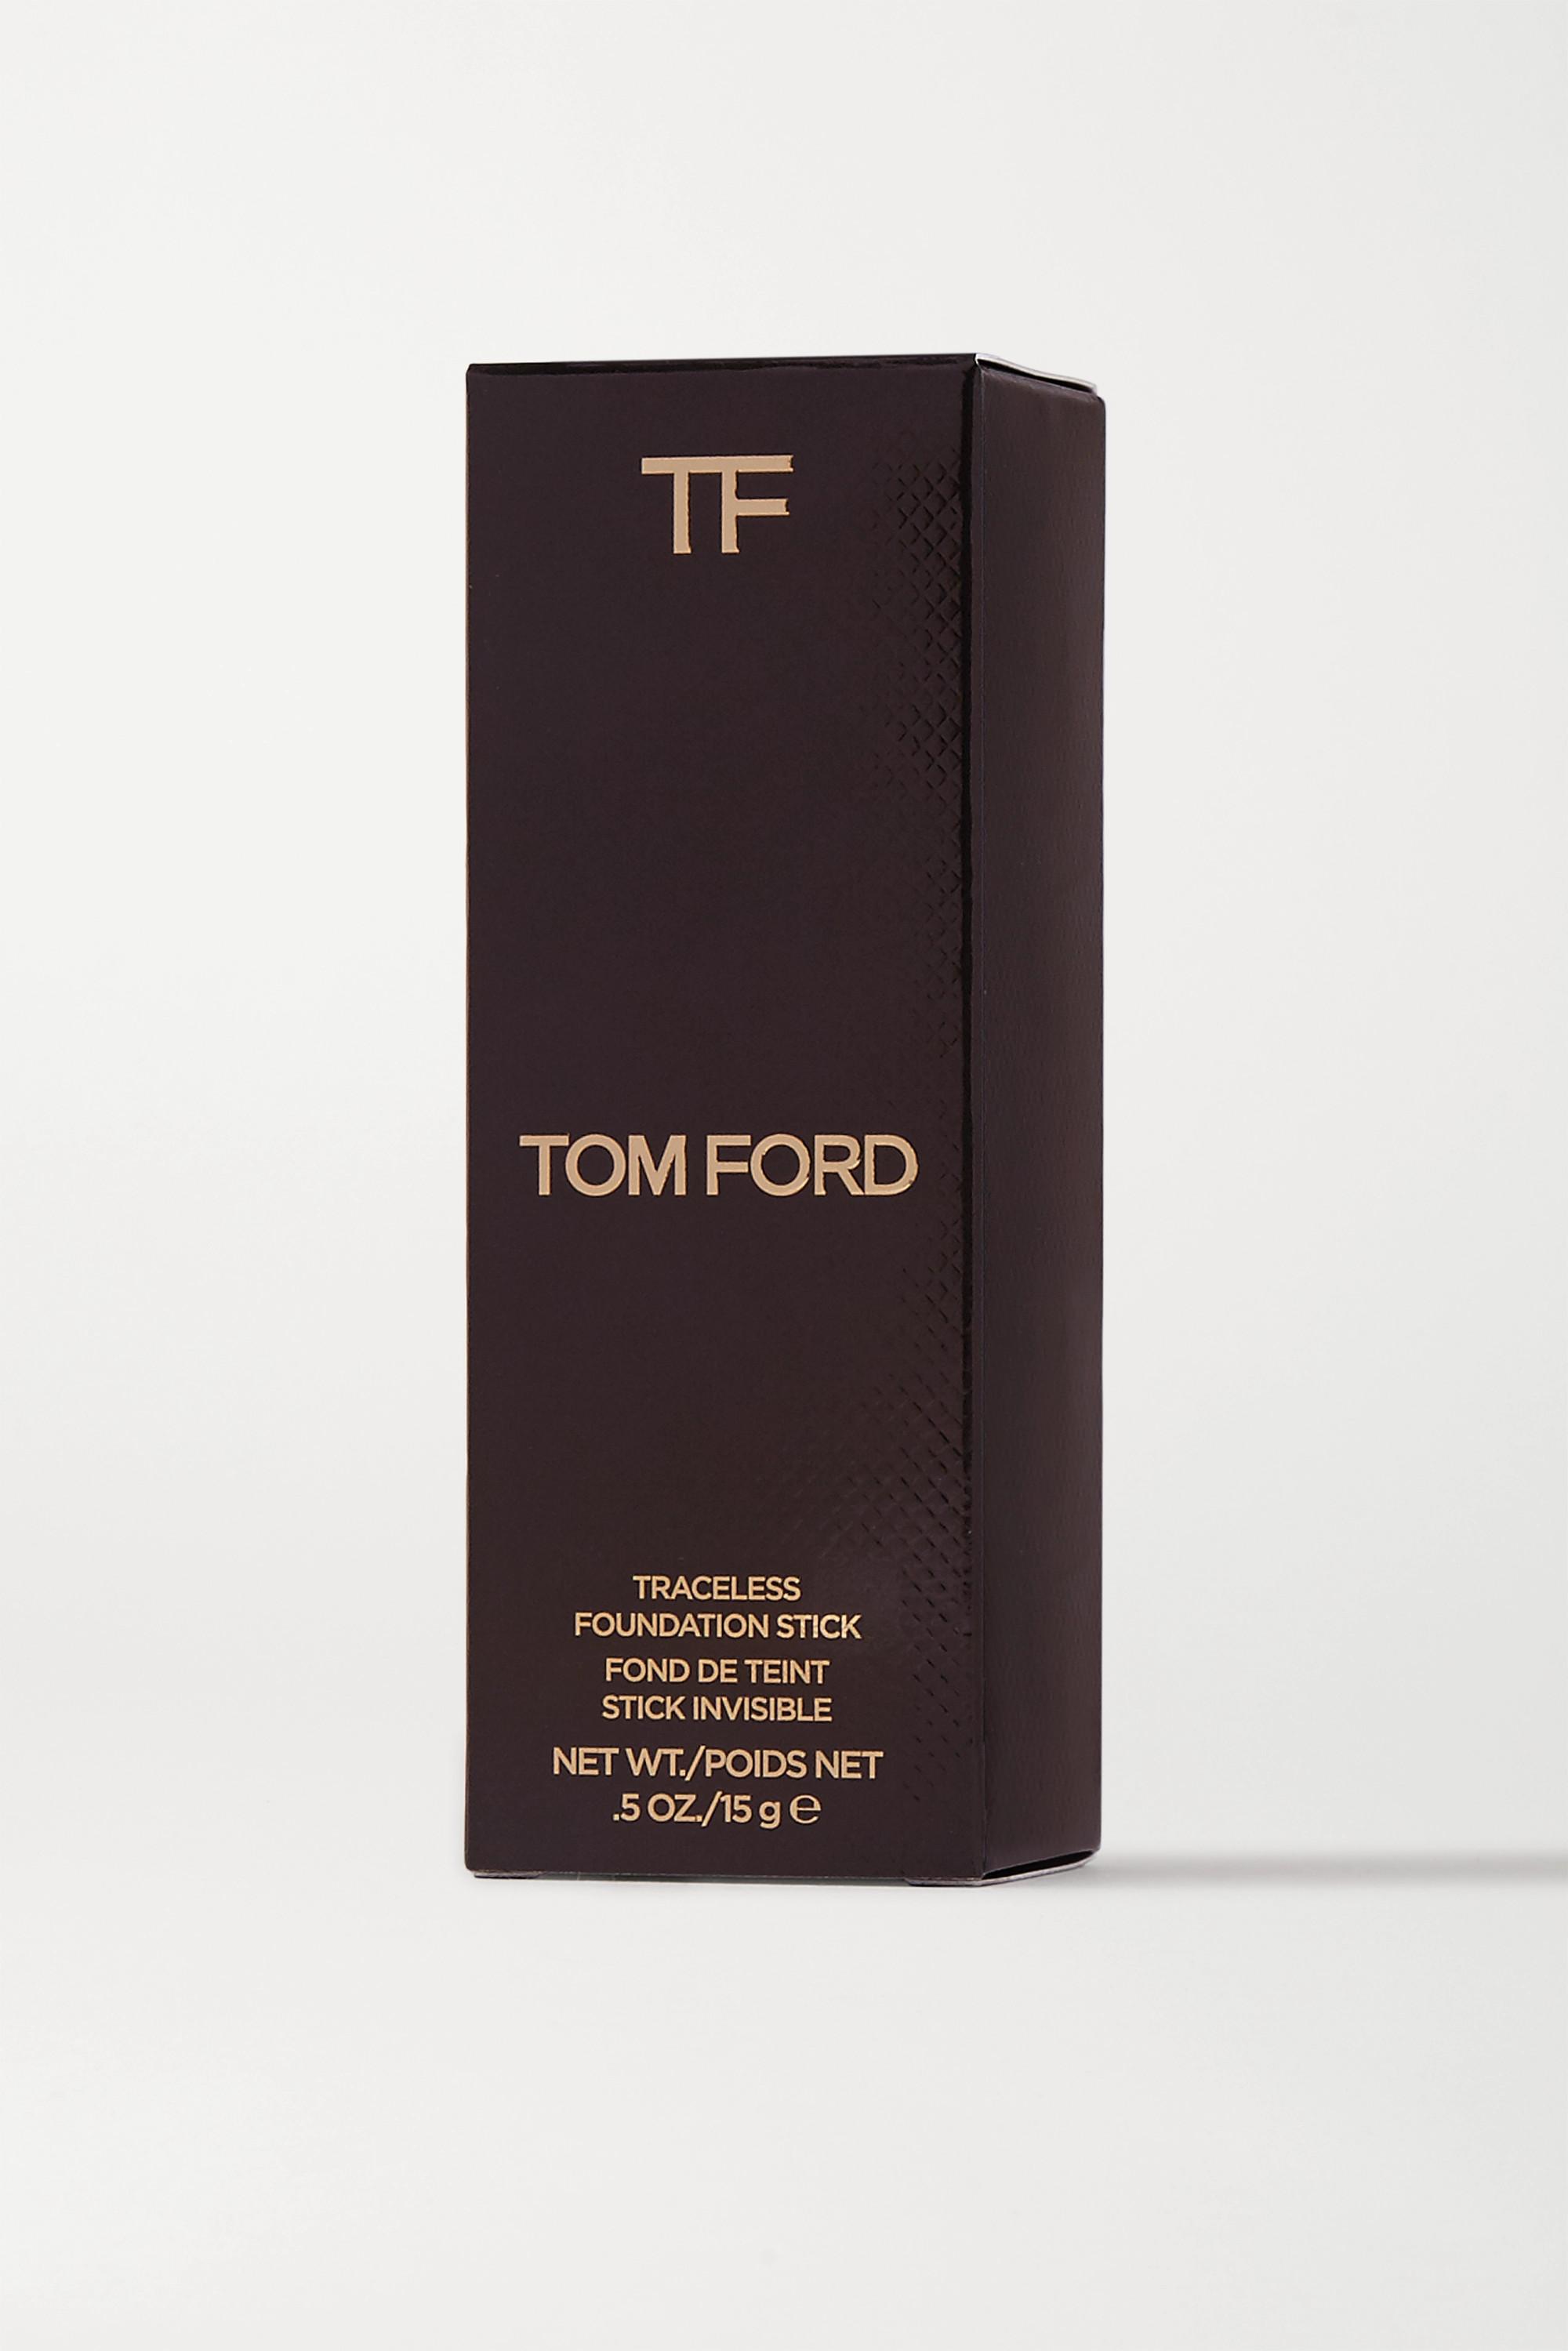 TOM FORD BEAUTY Fond de teint stick Invisible, 13.0 Espresso